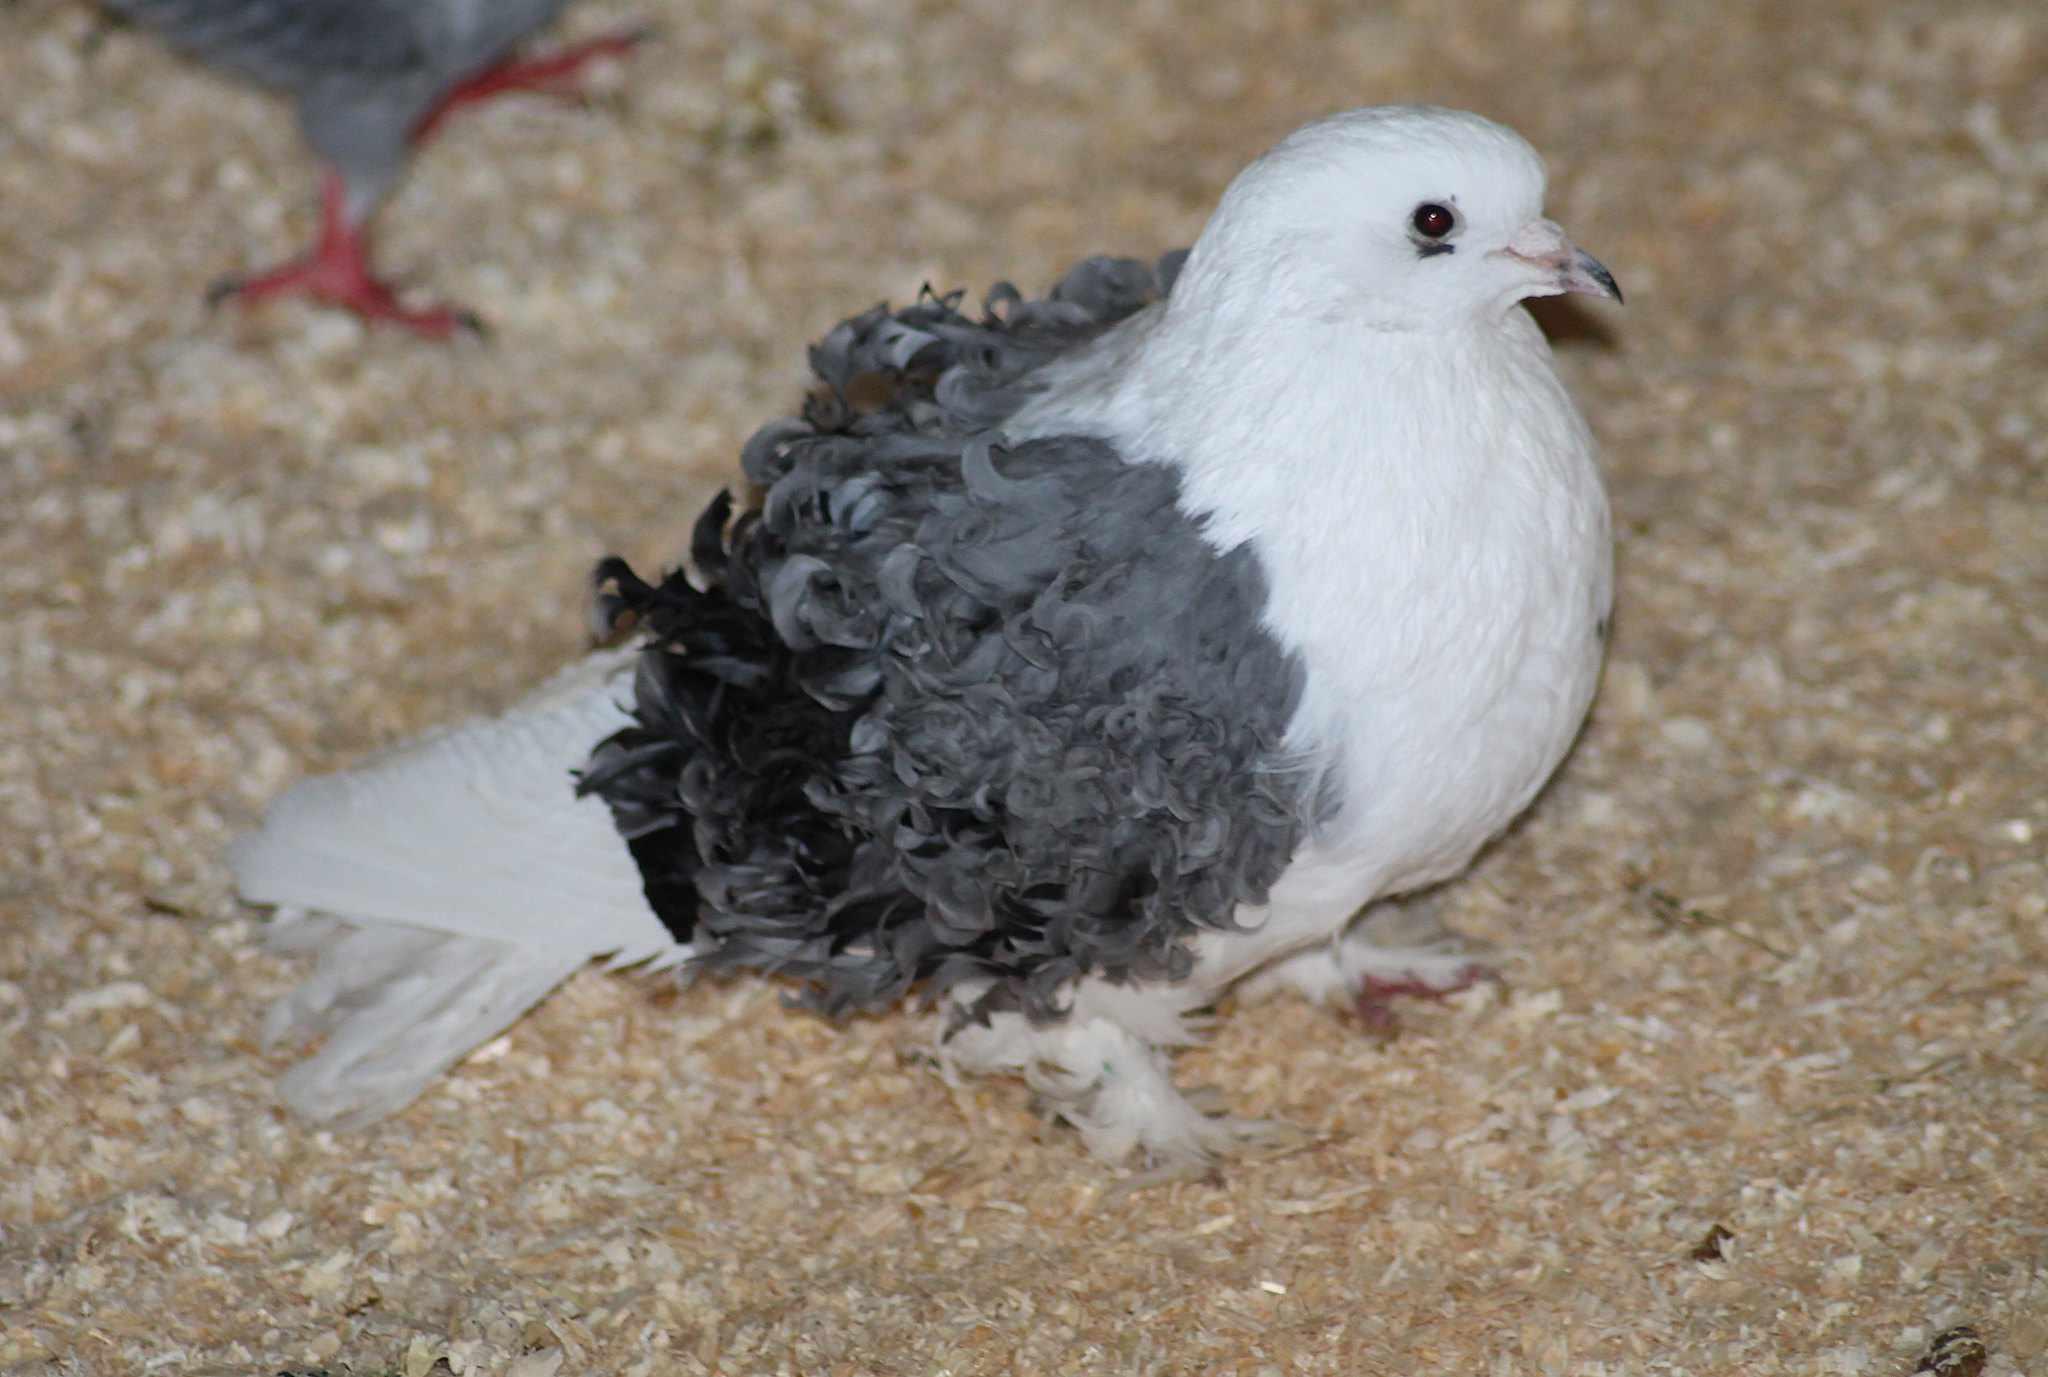 Frillback pigeon standing on sawdust